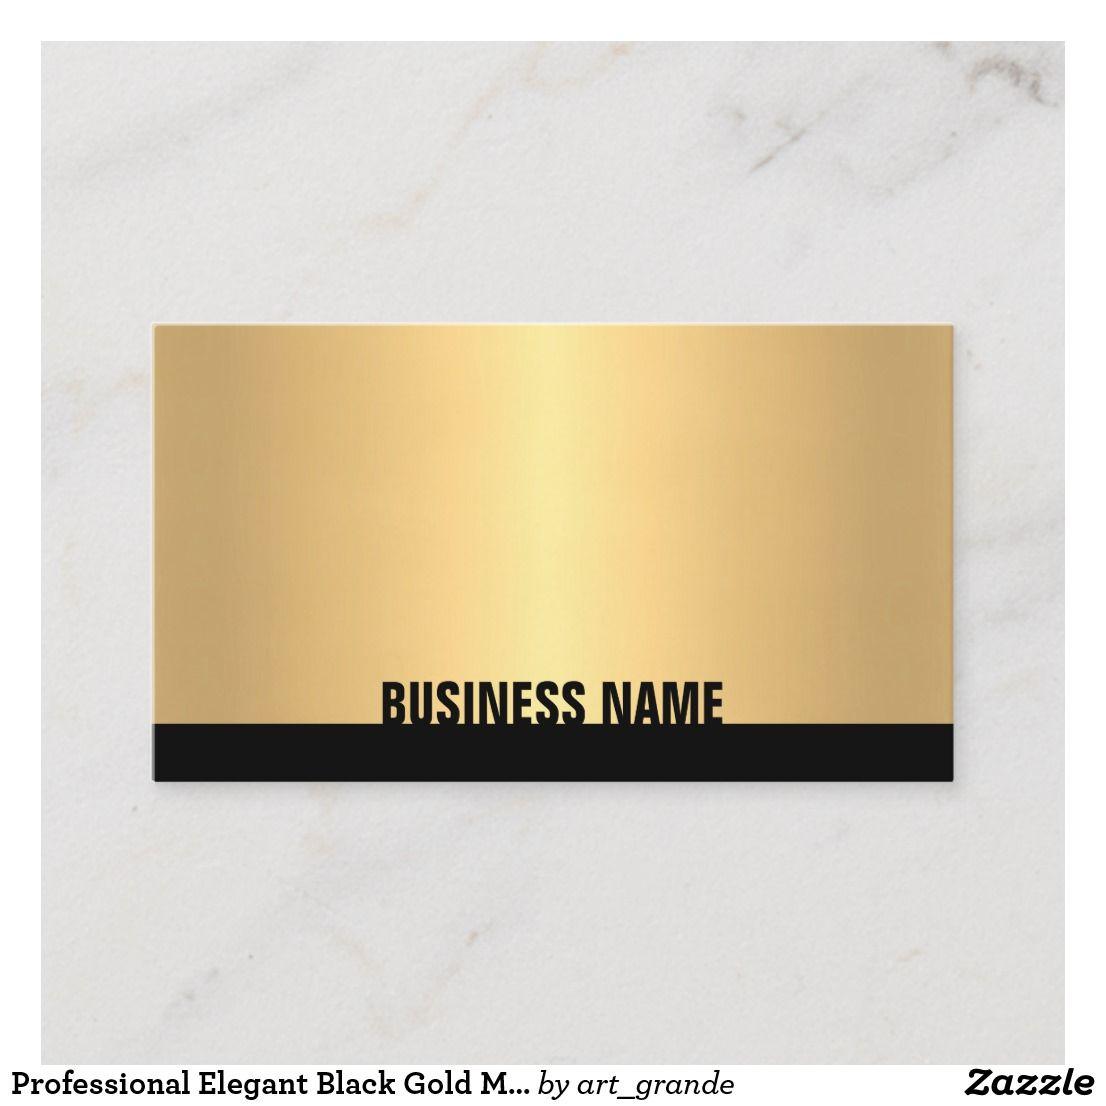 Professional Elegant Black Gold Modern Creative Business